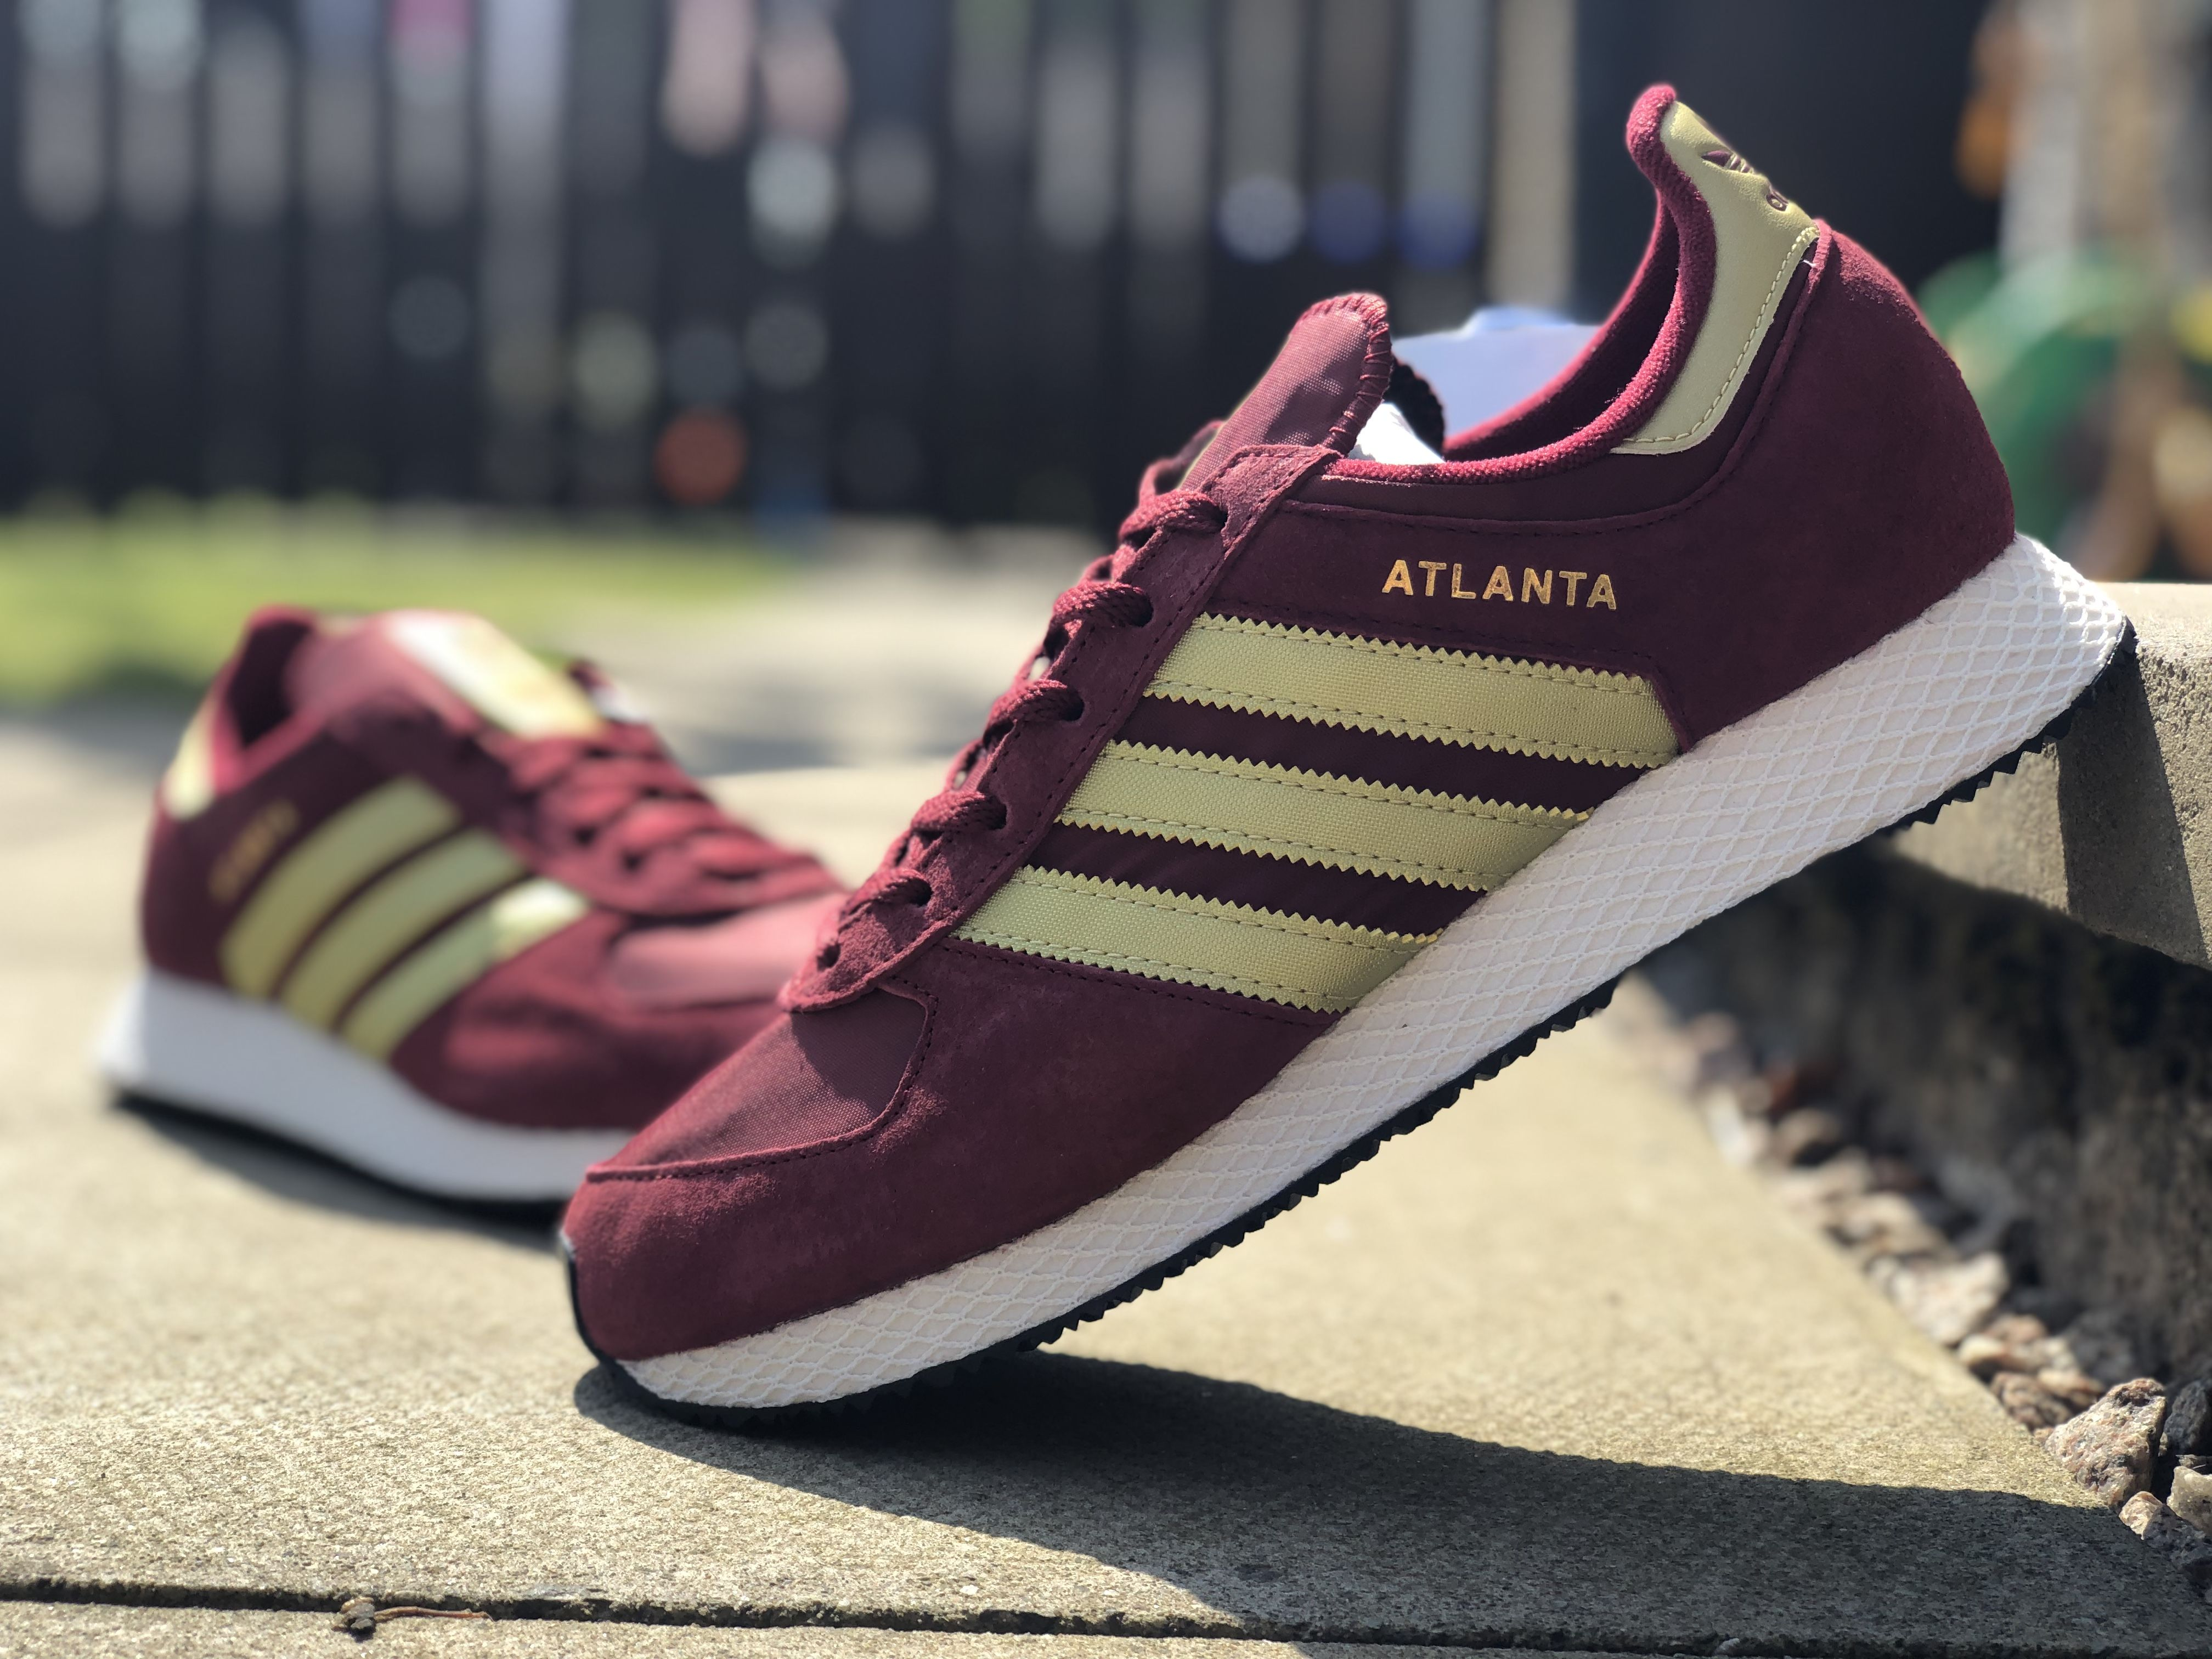 Adidas Atlanta | Adidas, Mens fashion rugged, Adidas trainers